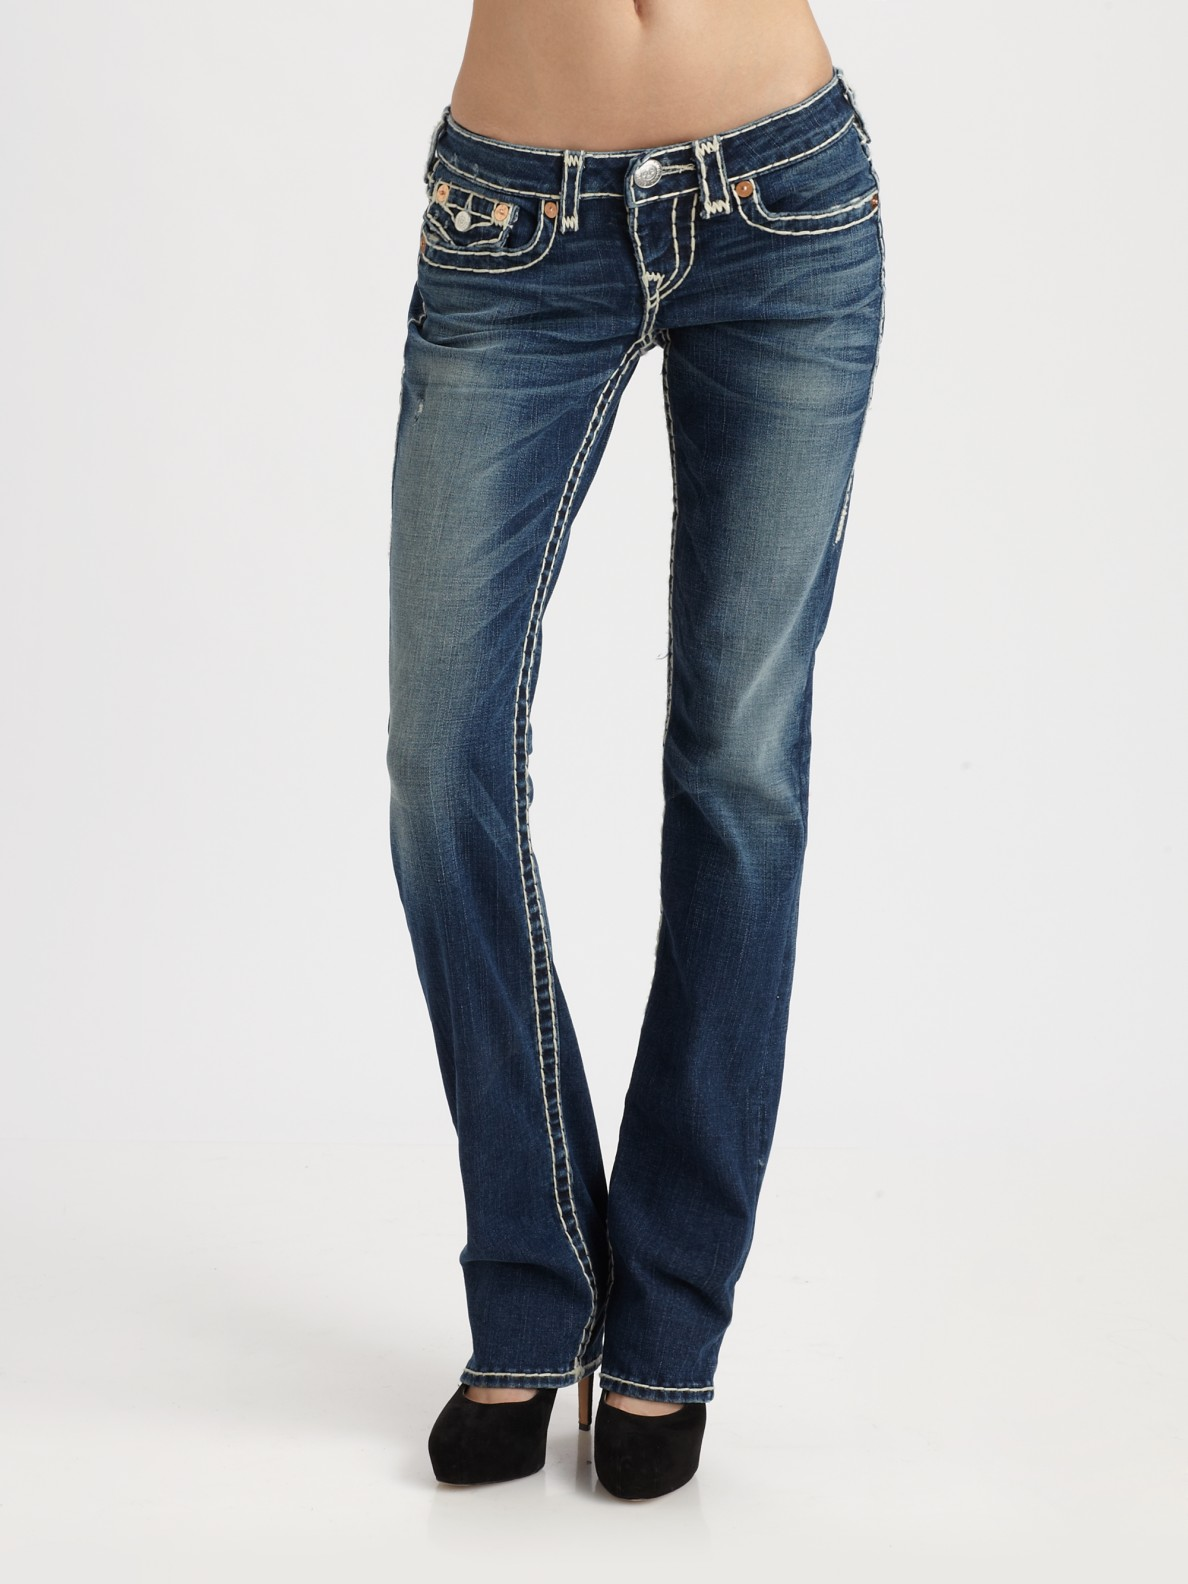 Super Skinny Jeans Womens